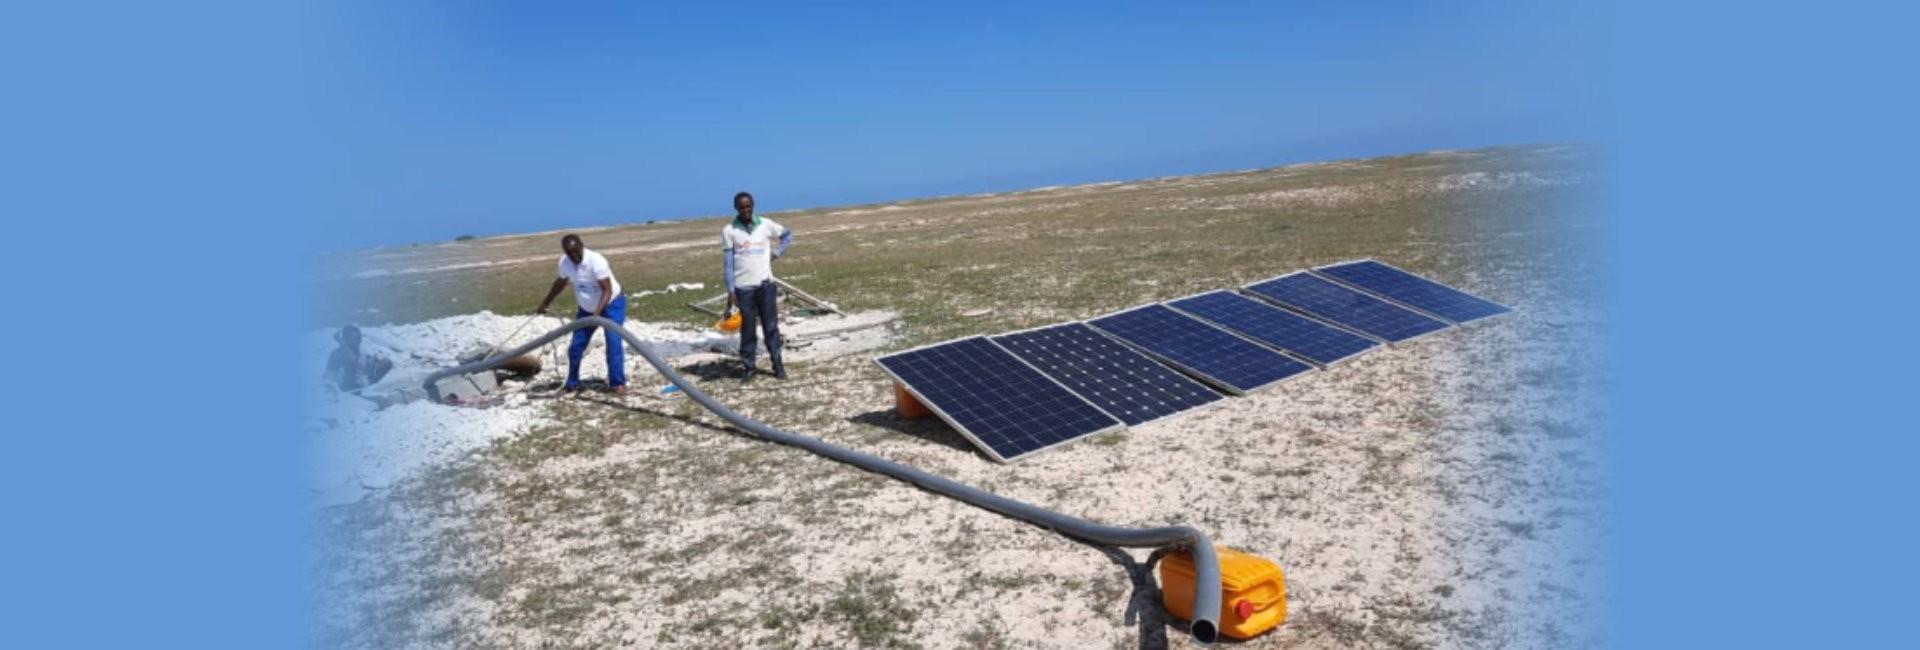 installing solar panel